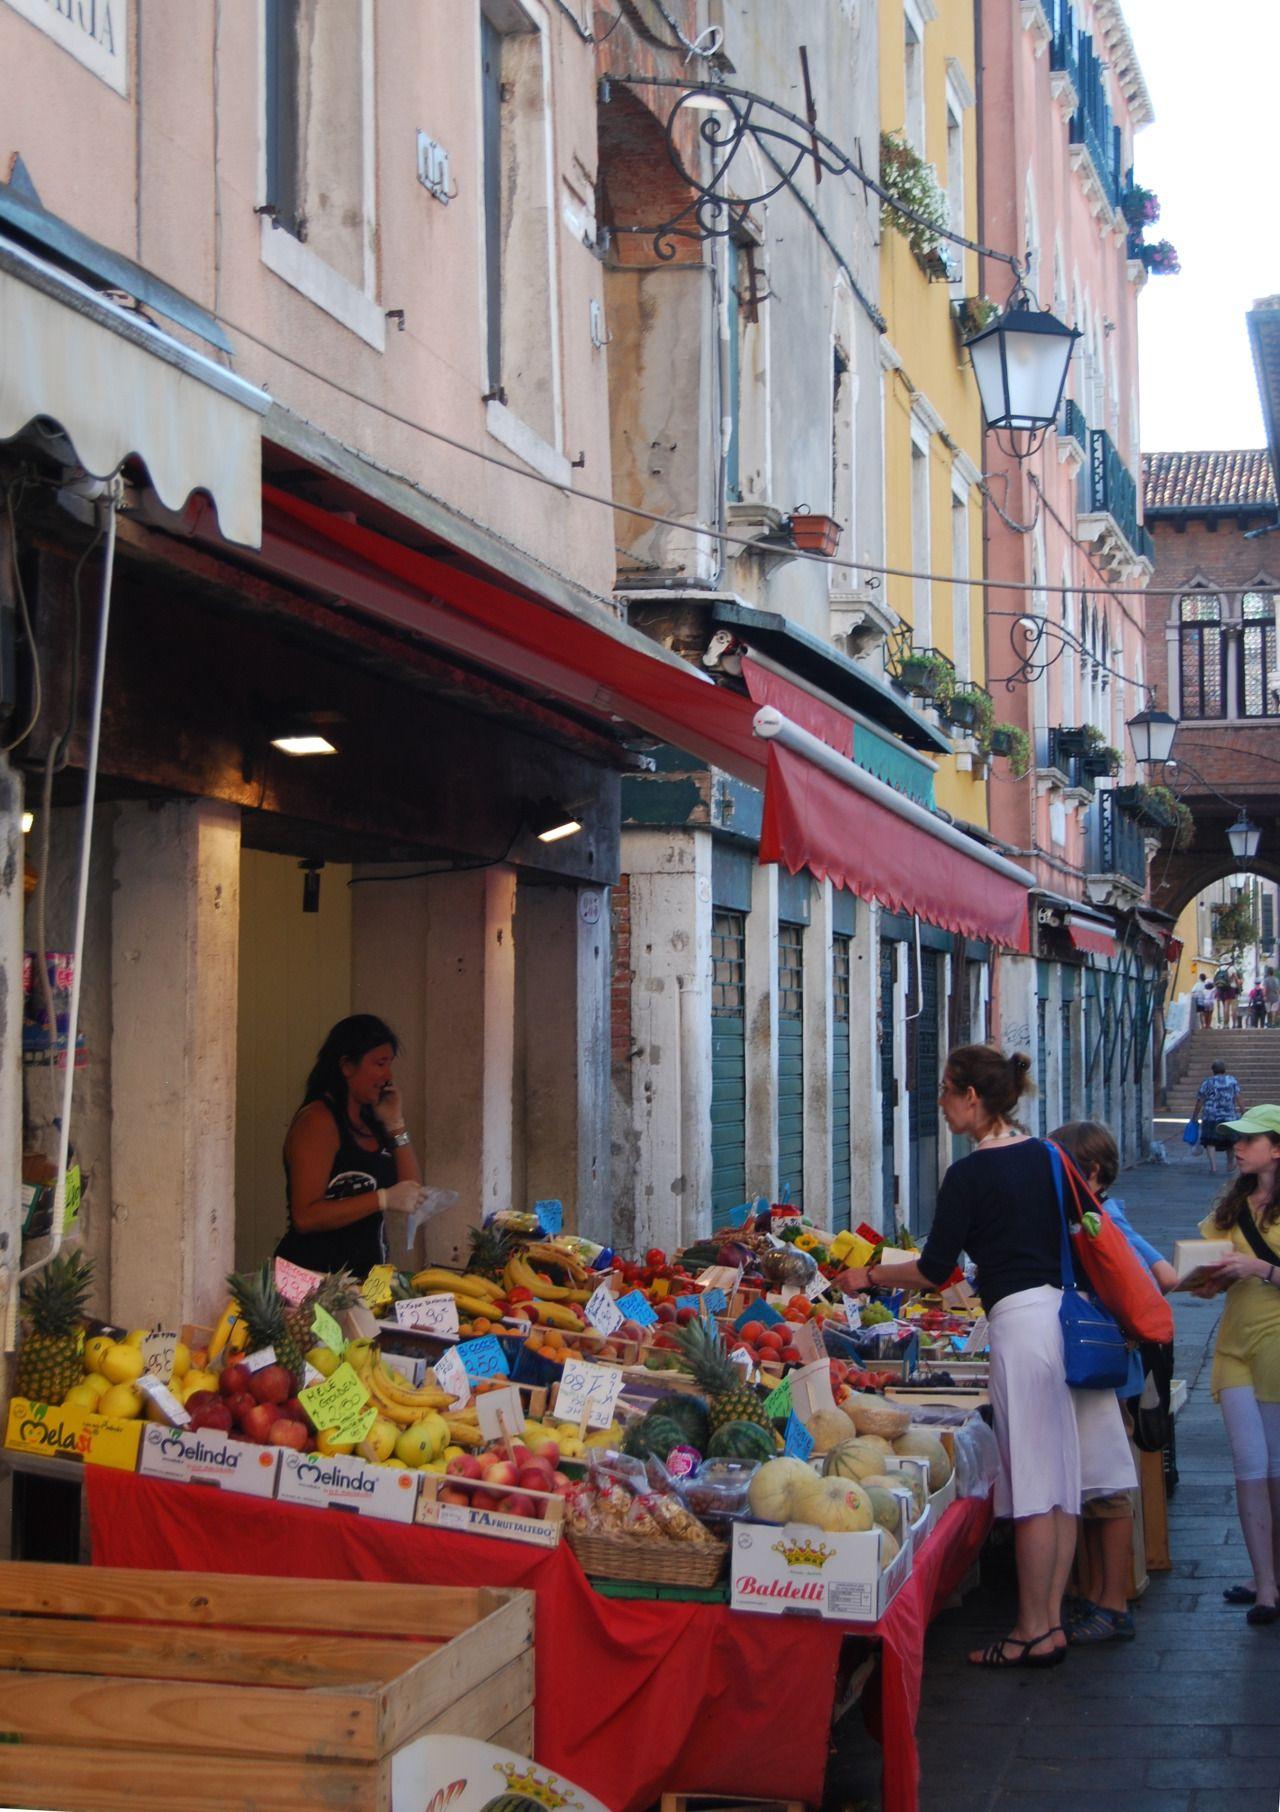 Fruit stall, Venice, Veneto 2011, Italy photography by cithopper2